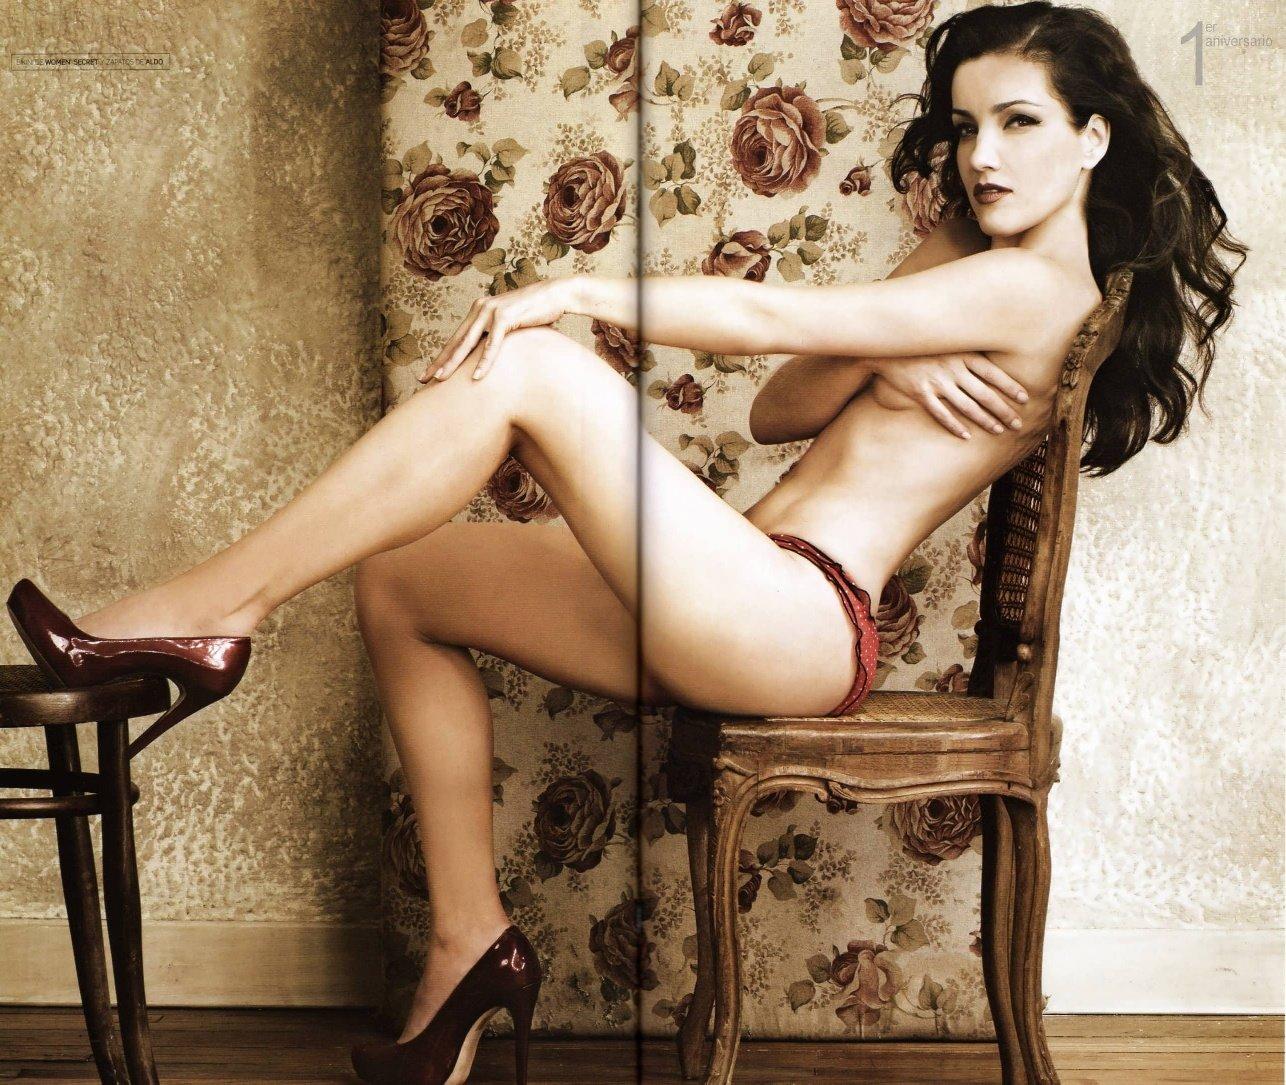 http://3.bp.blogspot.com/_yberMRekEGc/SQkxD3KAjUI/AAAAAAAAIjQ/Qcxu7QuQ6sI/s1600/Karla%2BAlvarez-114.jpg